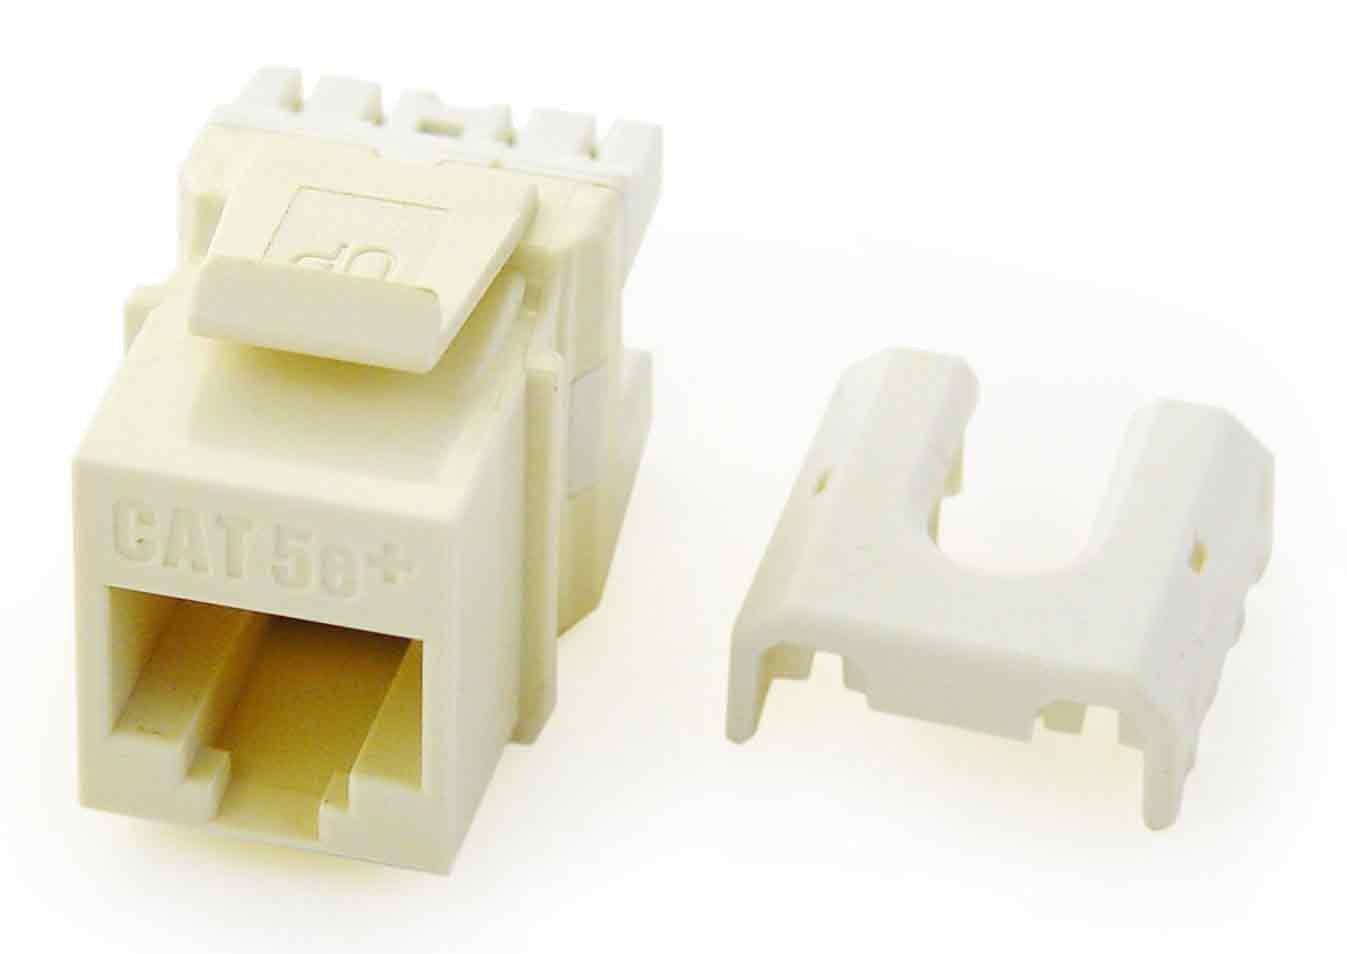 Legrand - On-Q WP3475LA50 RJ45 Cat5e QC Keystone Insert (50 pack), Light Almond